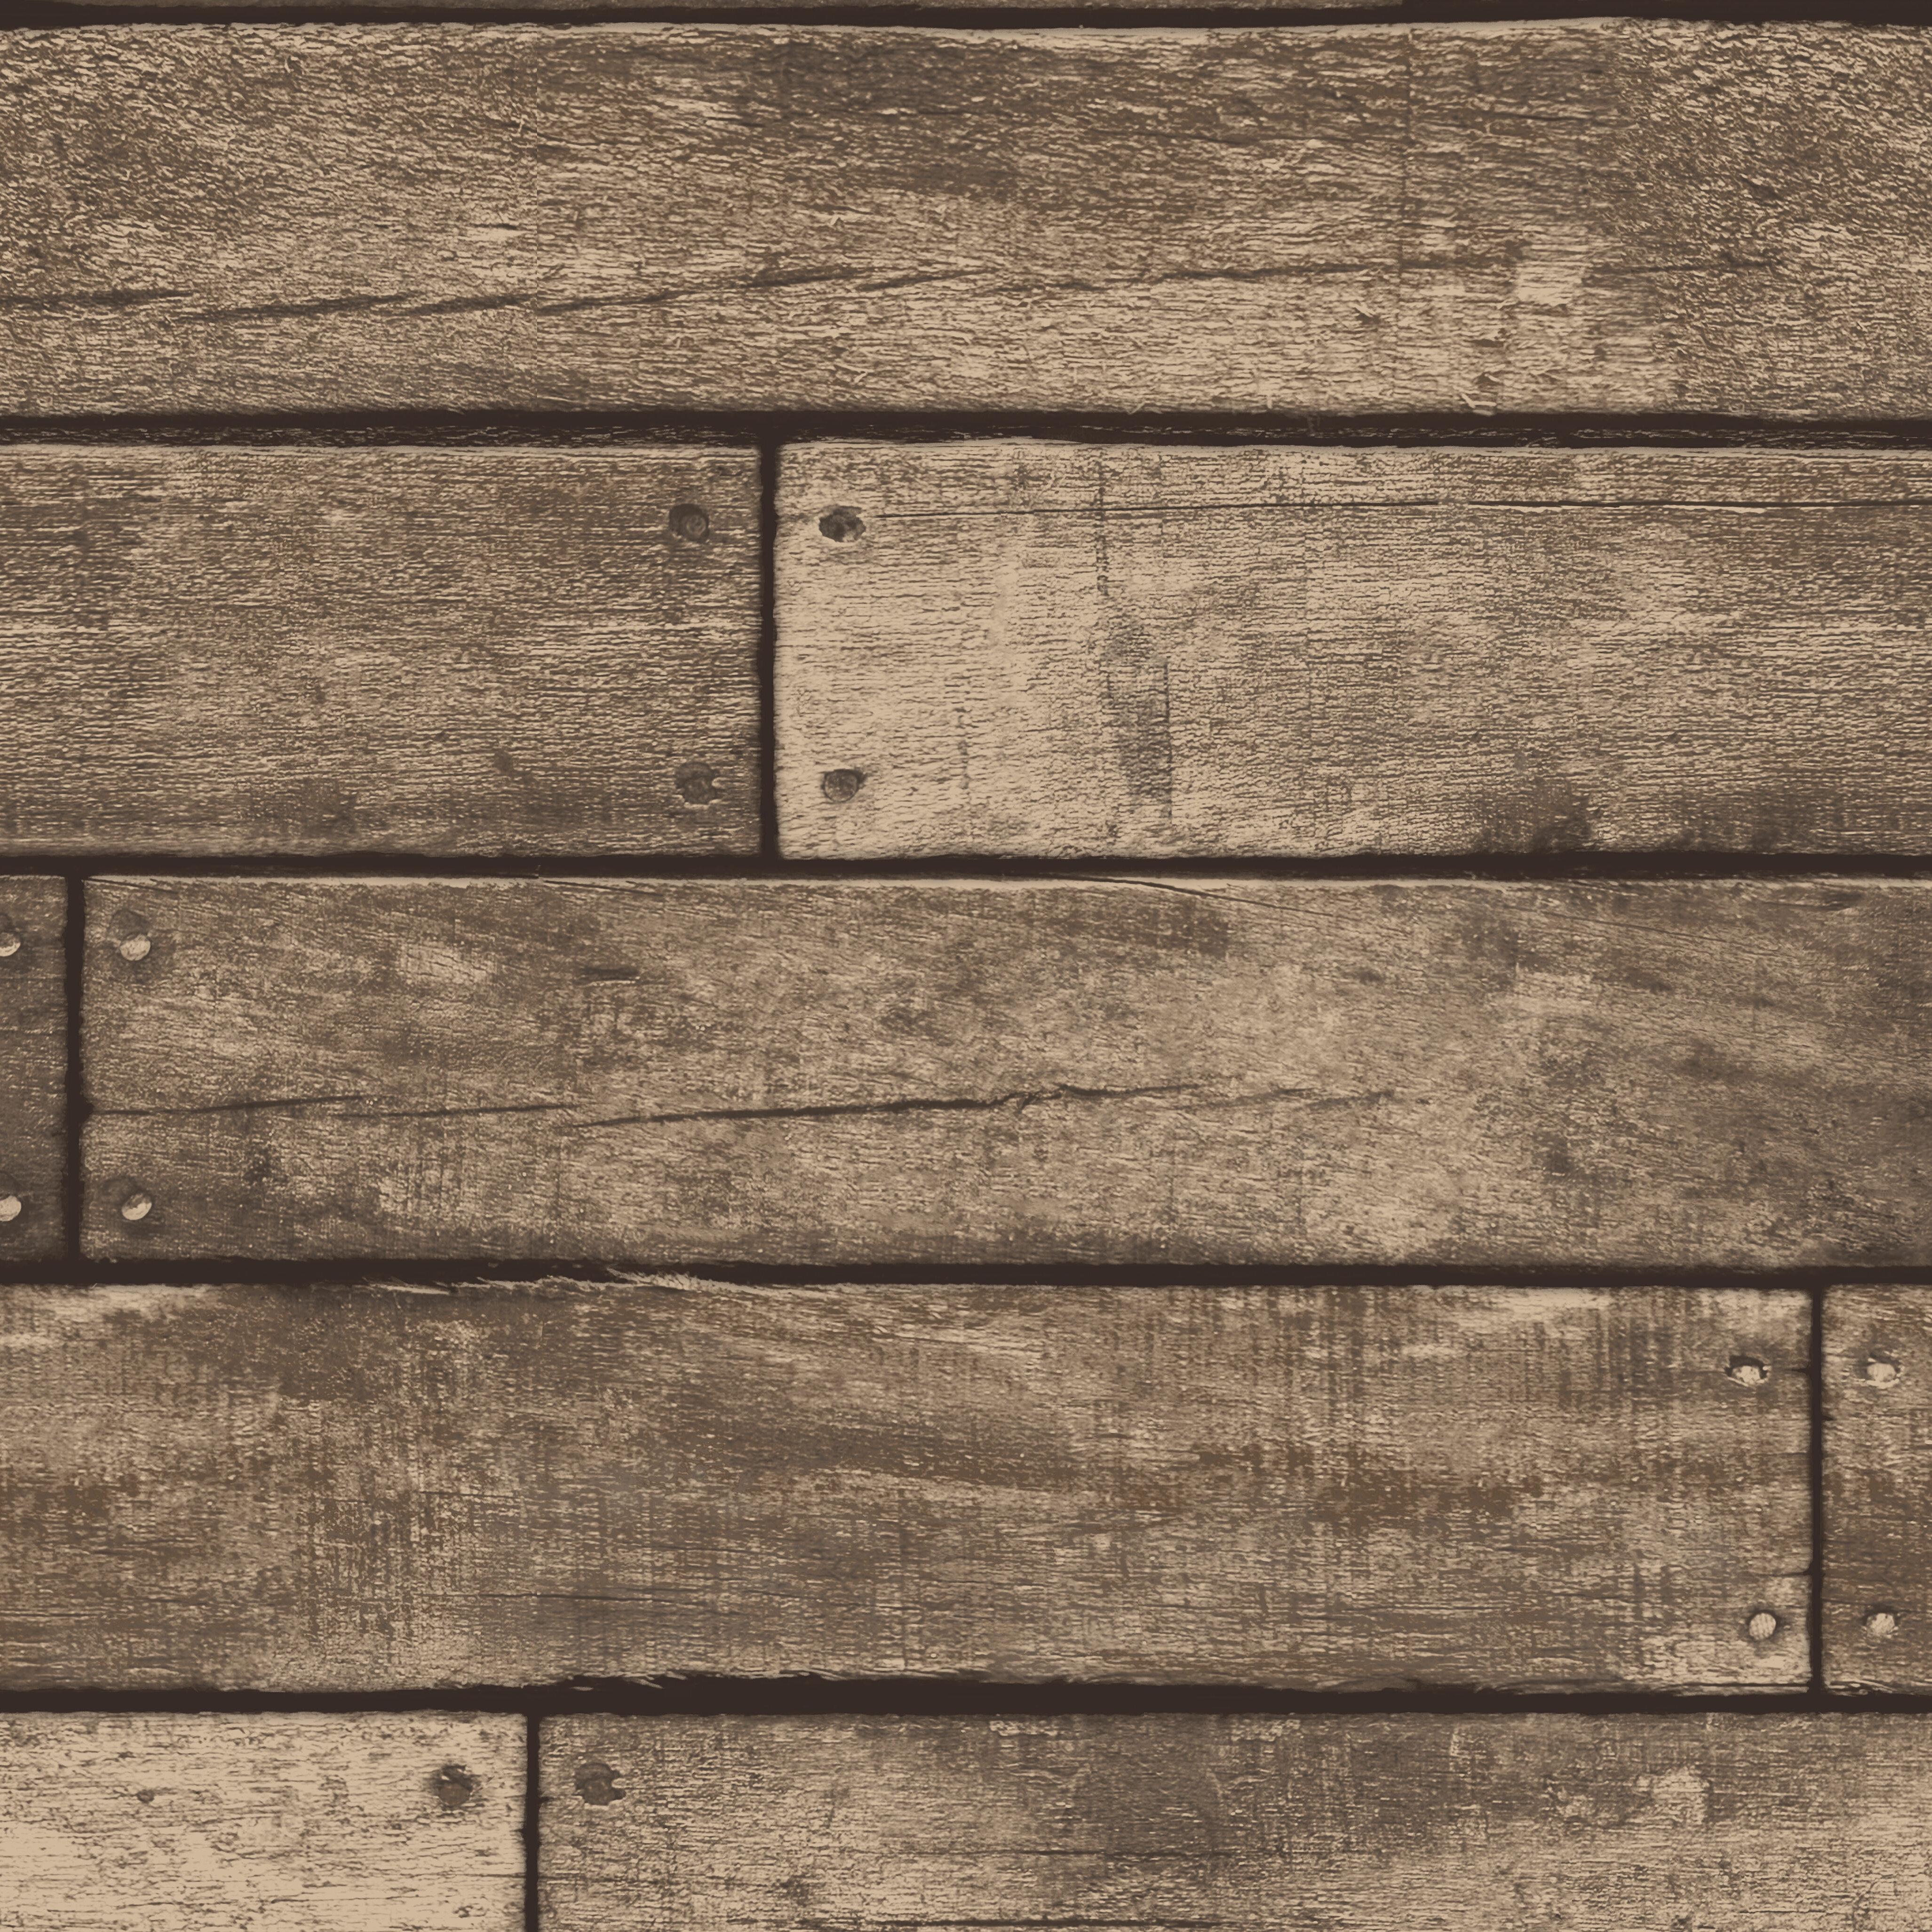 Distinctive Wooden Plank Sidewall 10m X 52cm Wallpaper Roll